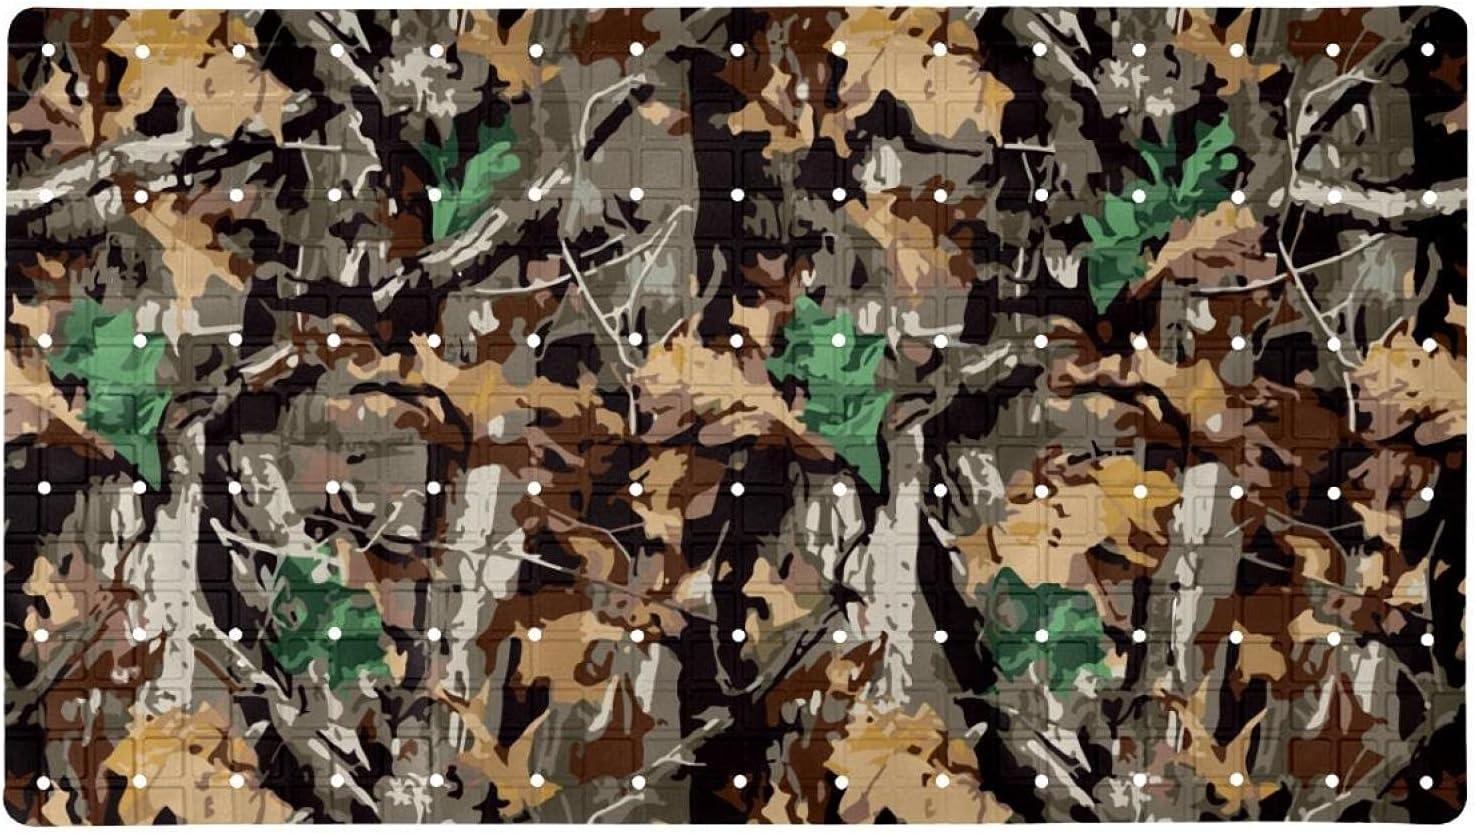 Bath Tub Shower Mat 15.7x27.9 Genuine Pattern Backgrou inches Camouflage Regular dealer